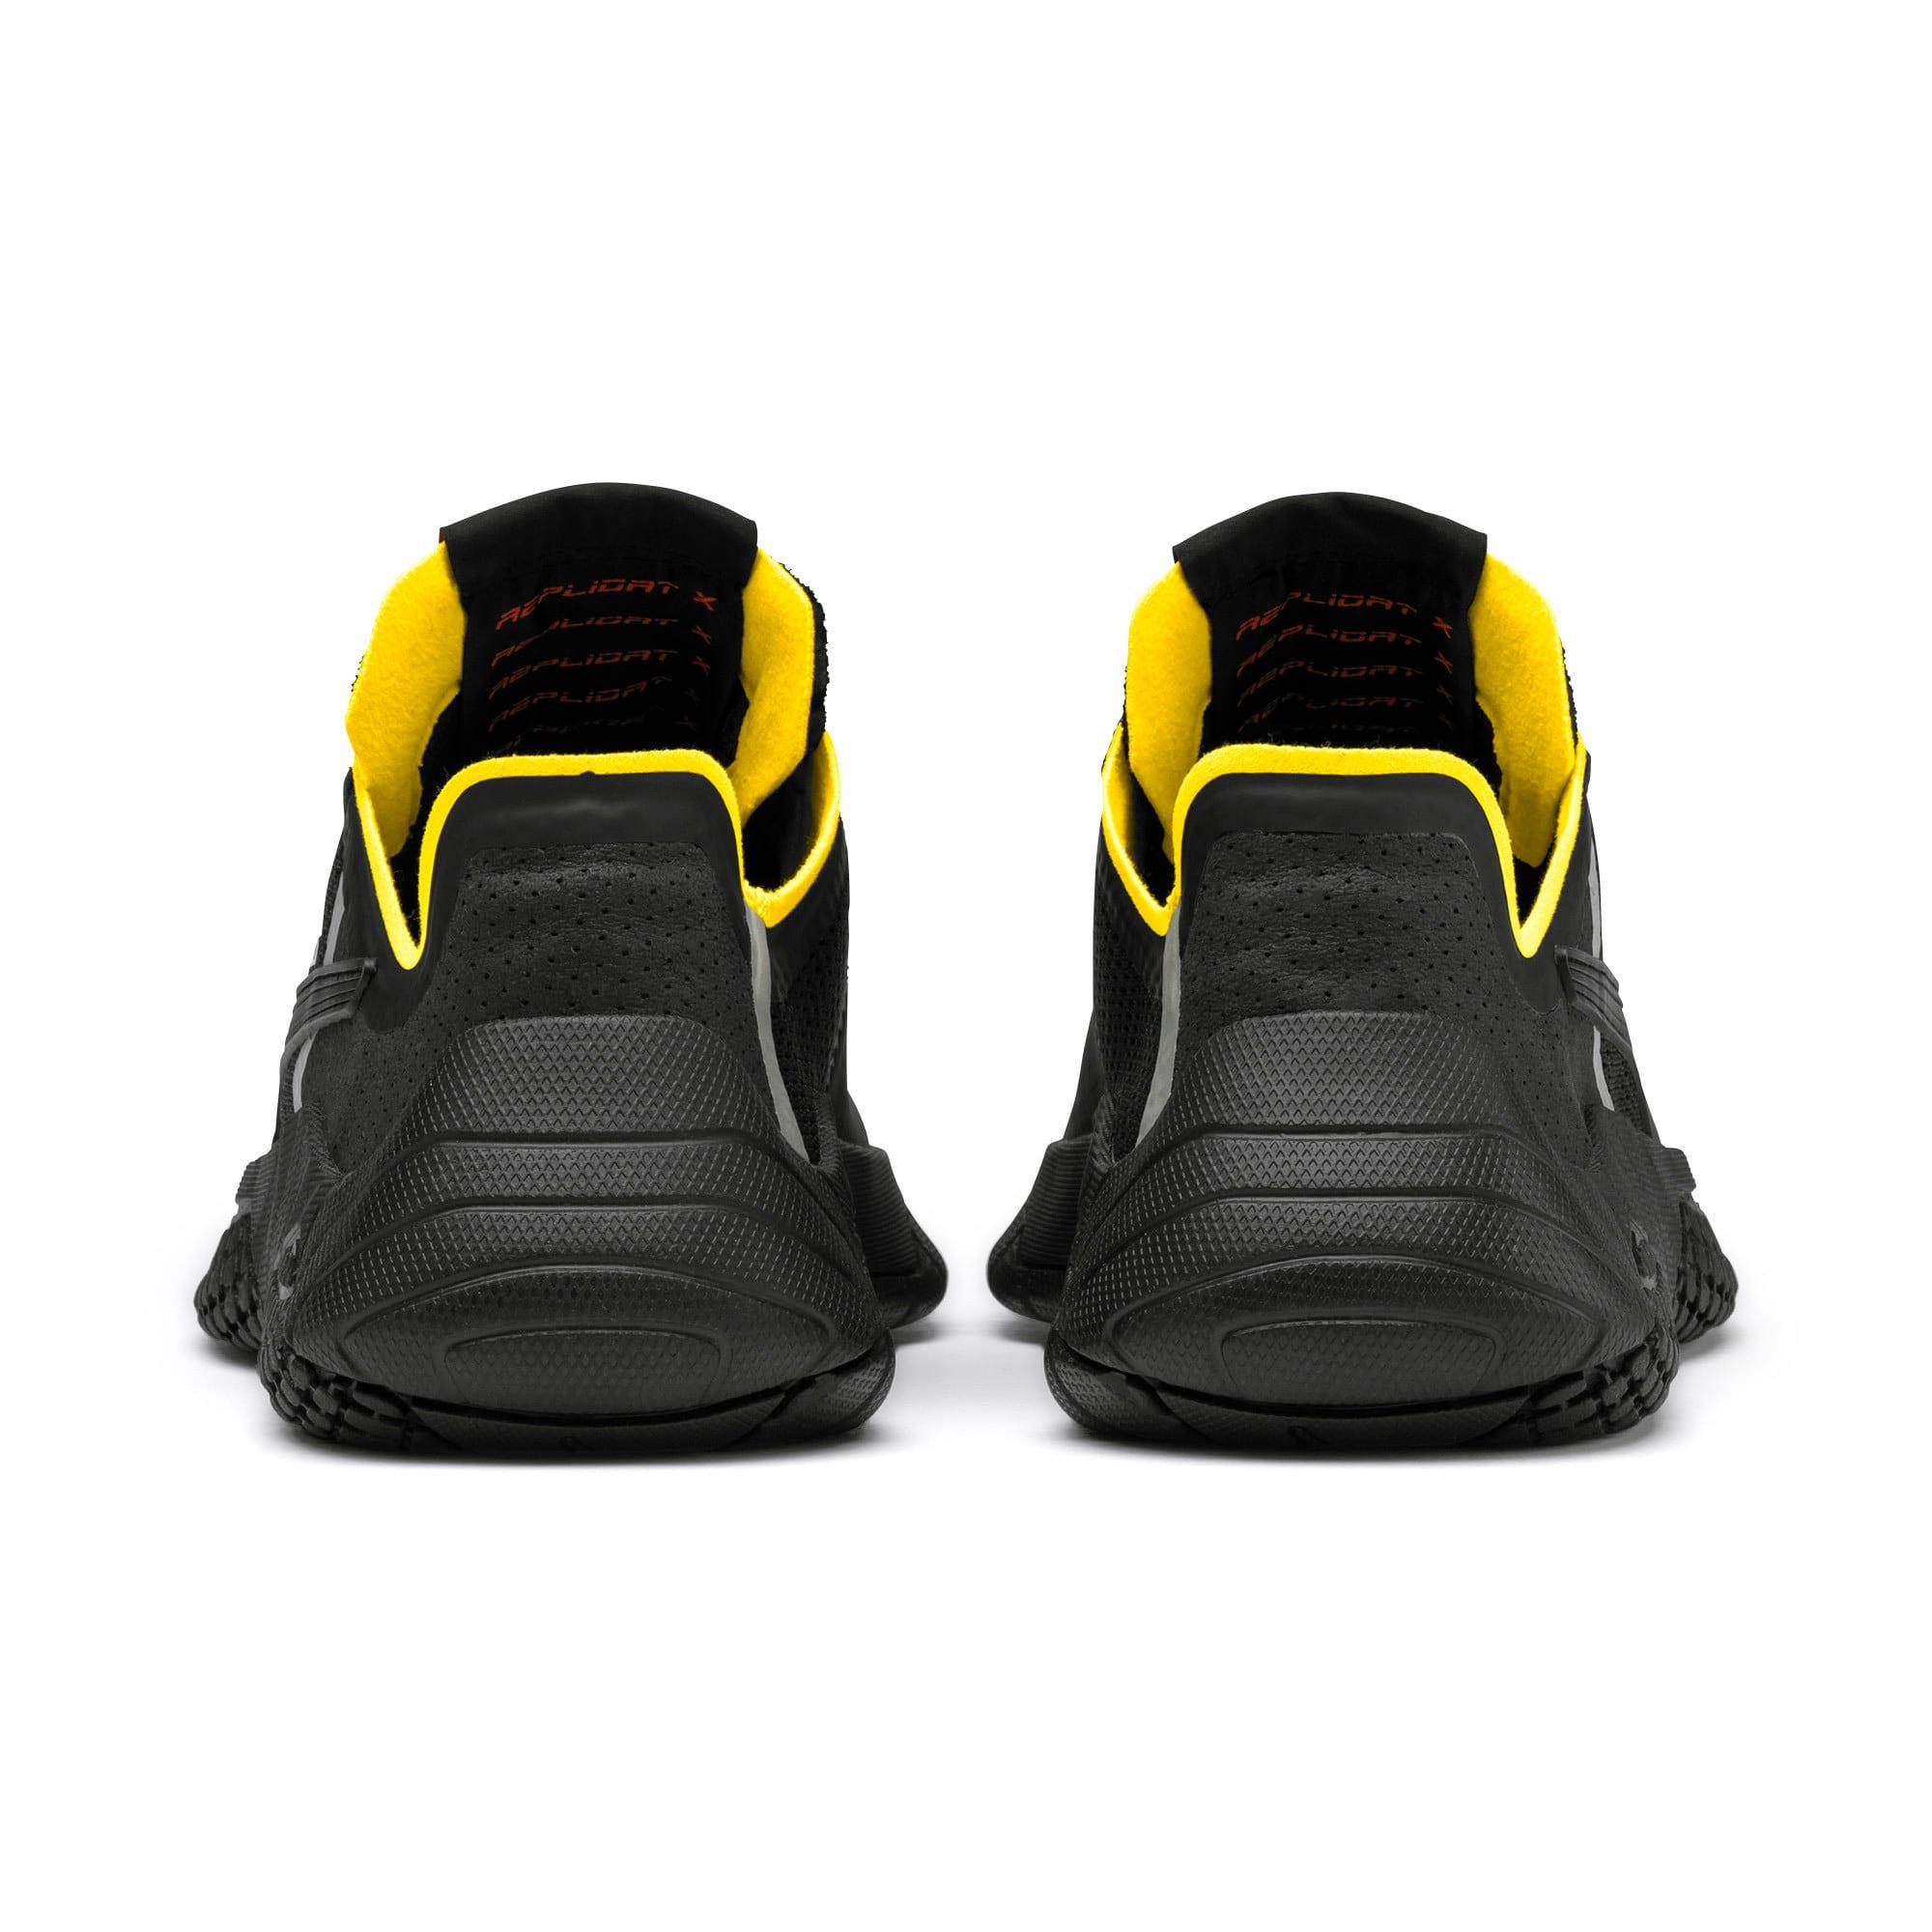 Thumbnail 3 of Pirelli Replicat-X Trainers, Black-Black-Cyber Yellow, medium